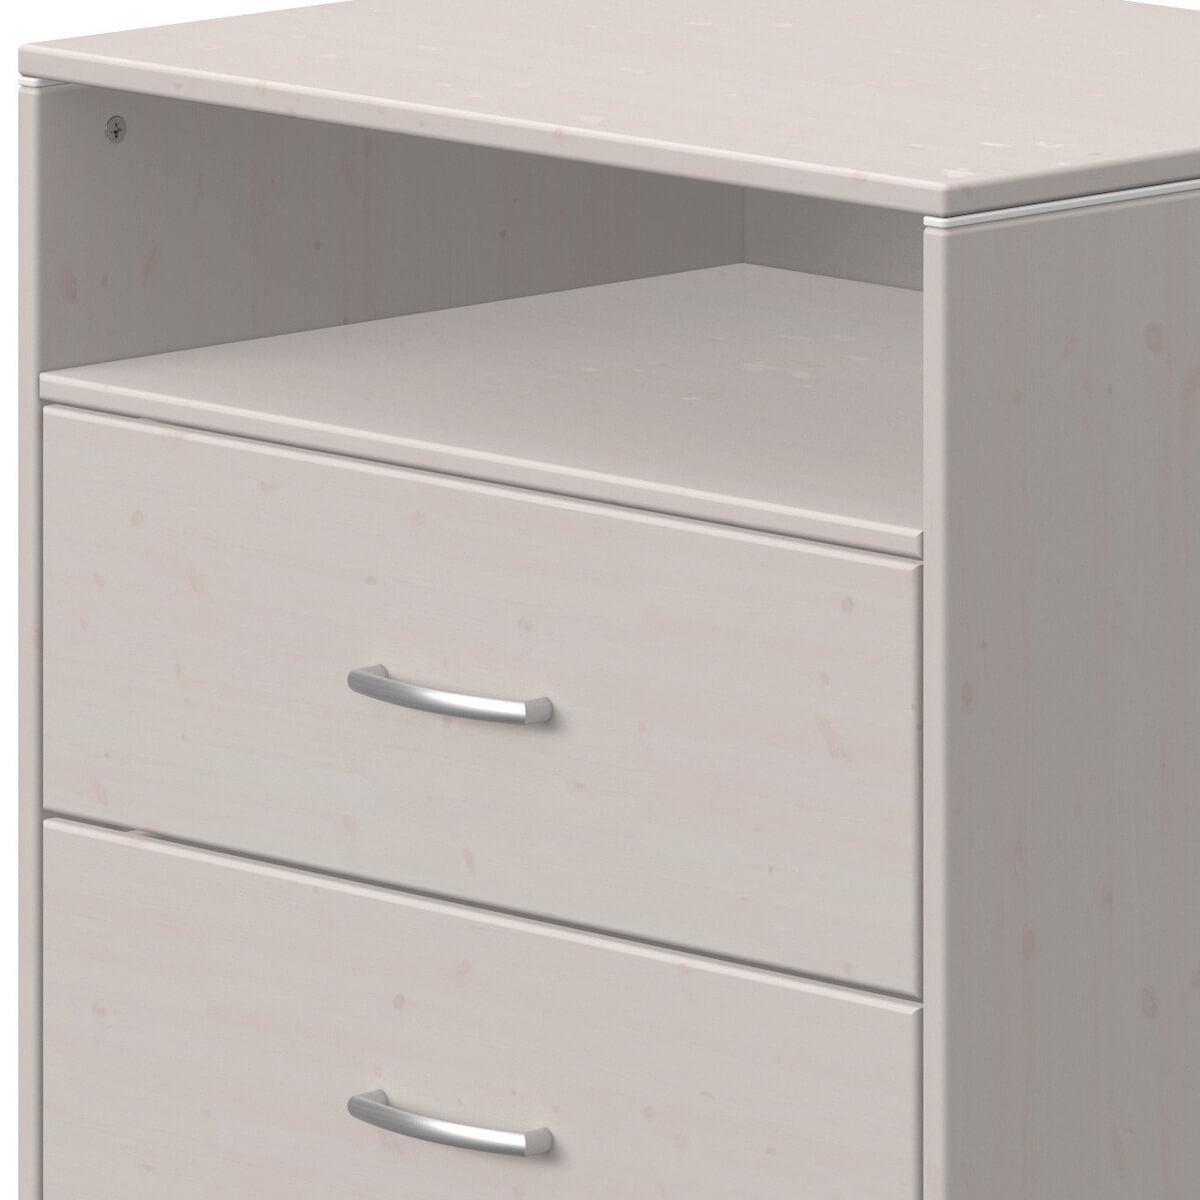 Cajonera 2 cajones-1 estante CLASSIC Flexa grey washed